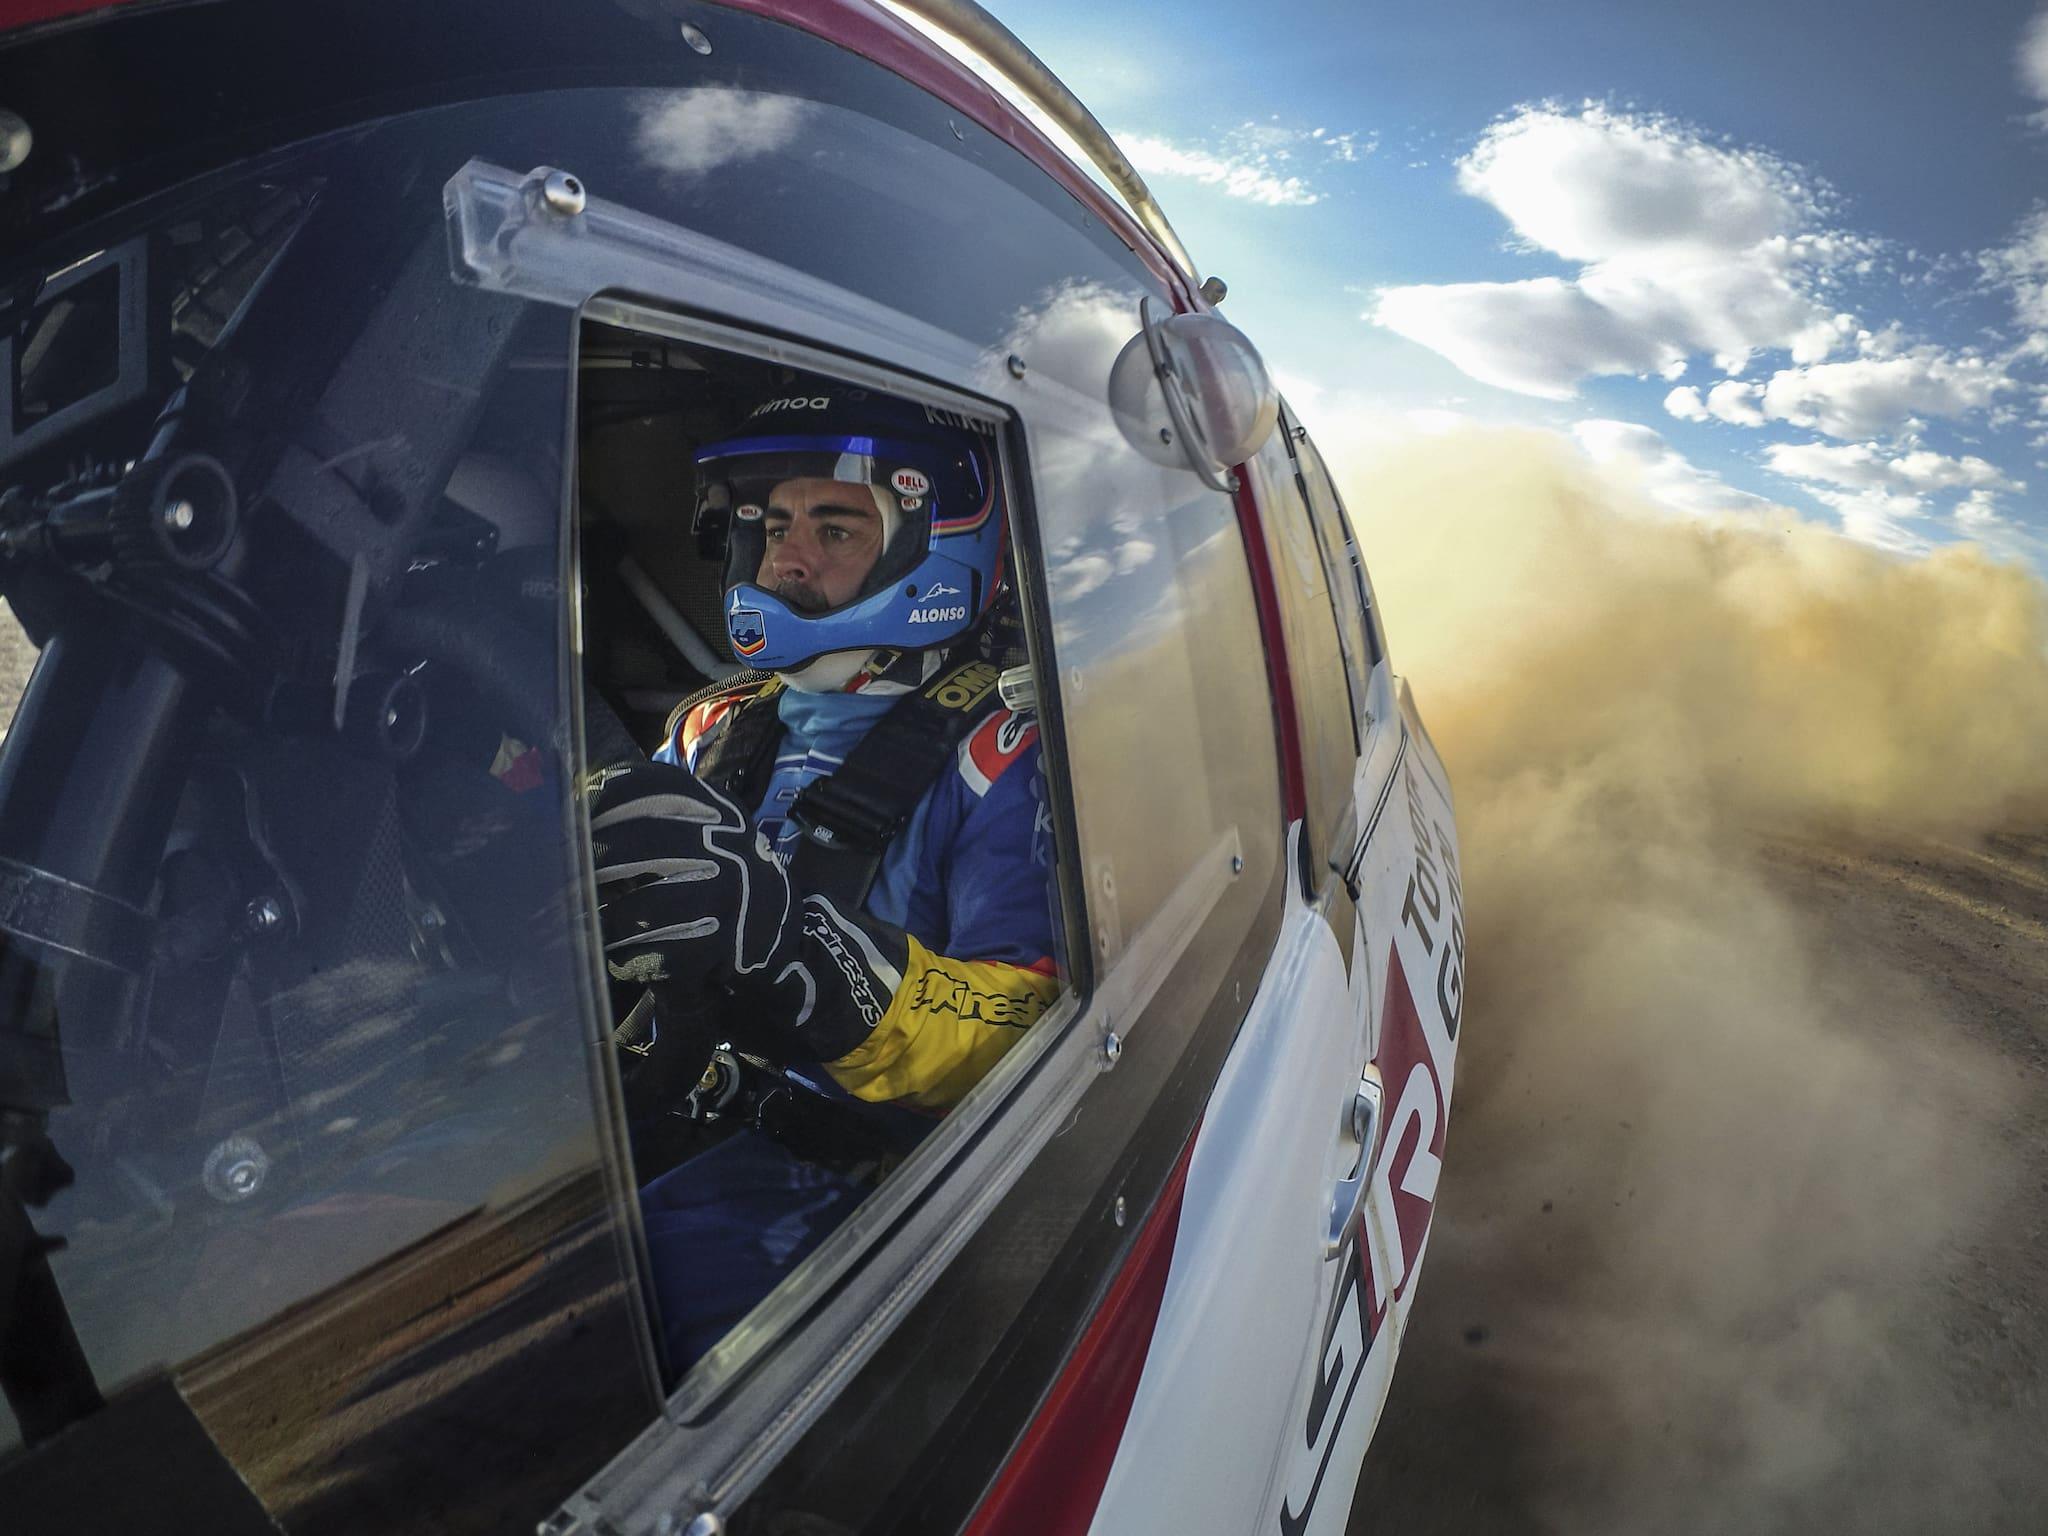 Fernando Alonso Keeps Eye on Dakar with Toyota Gazoo Racing